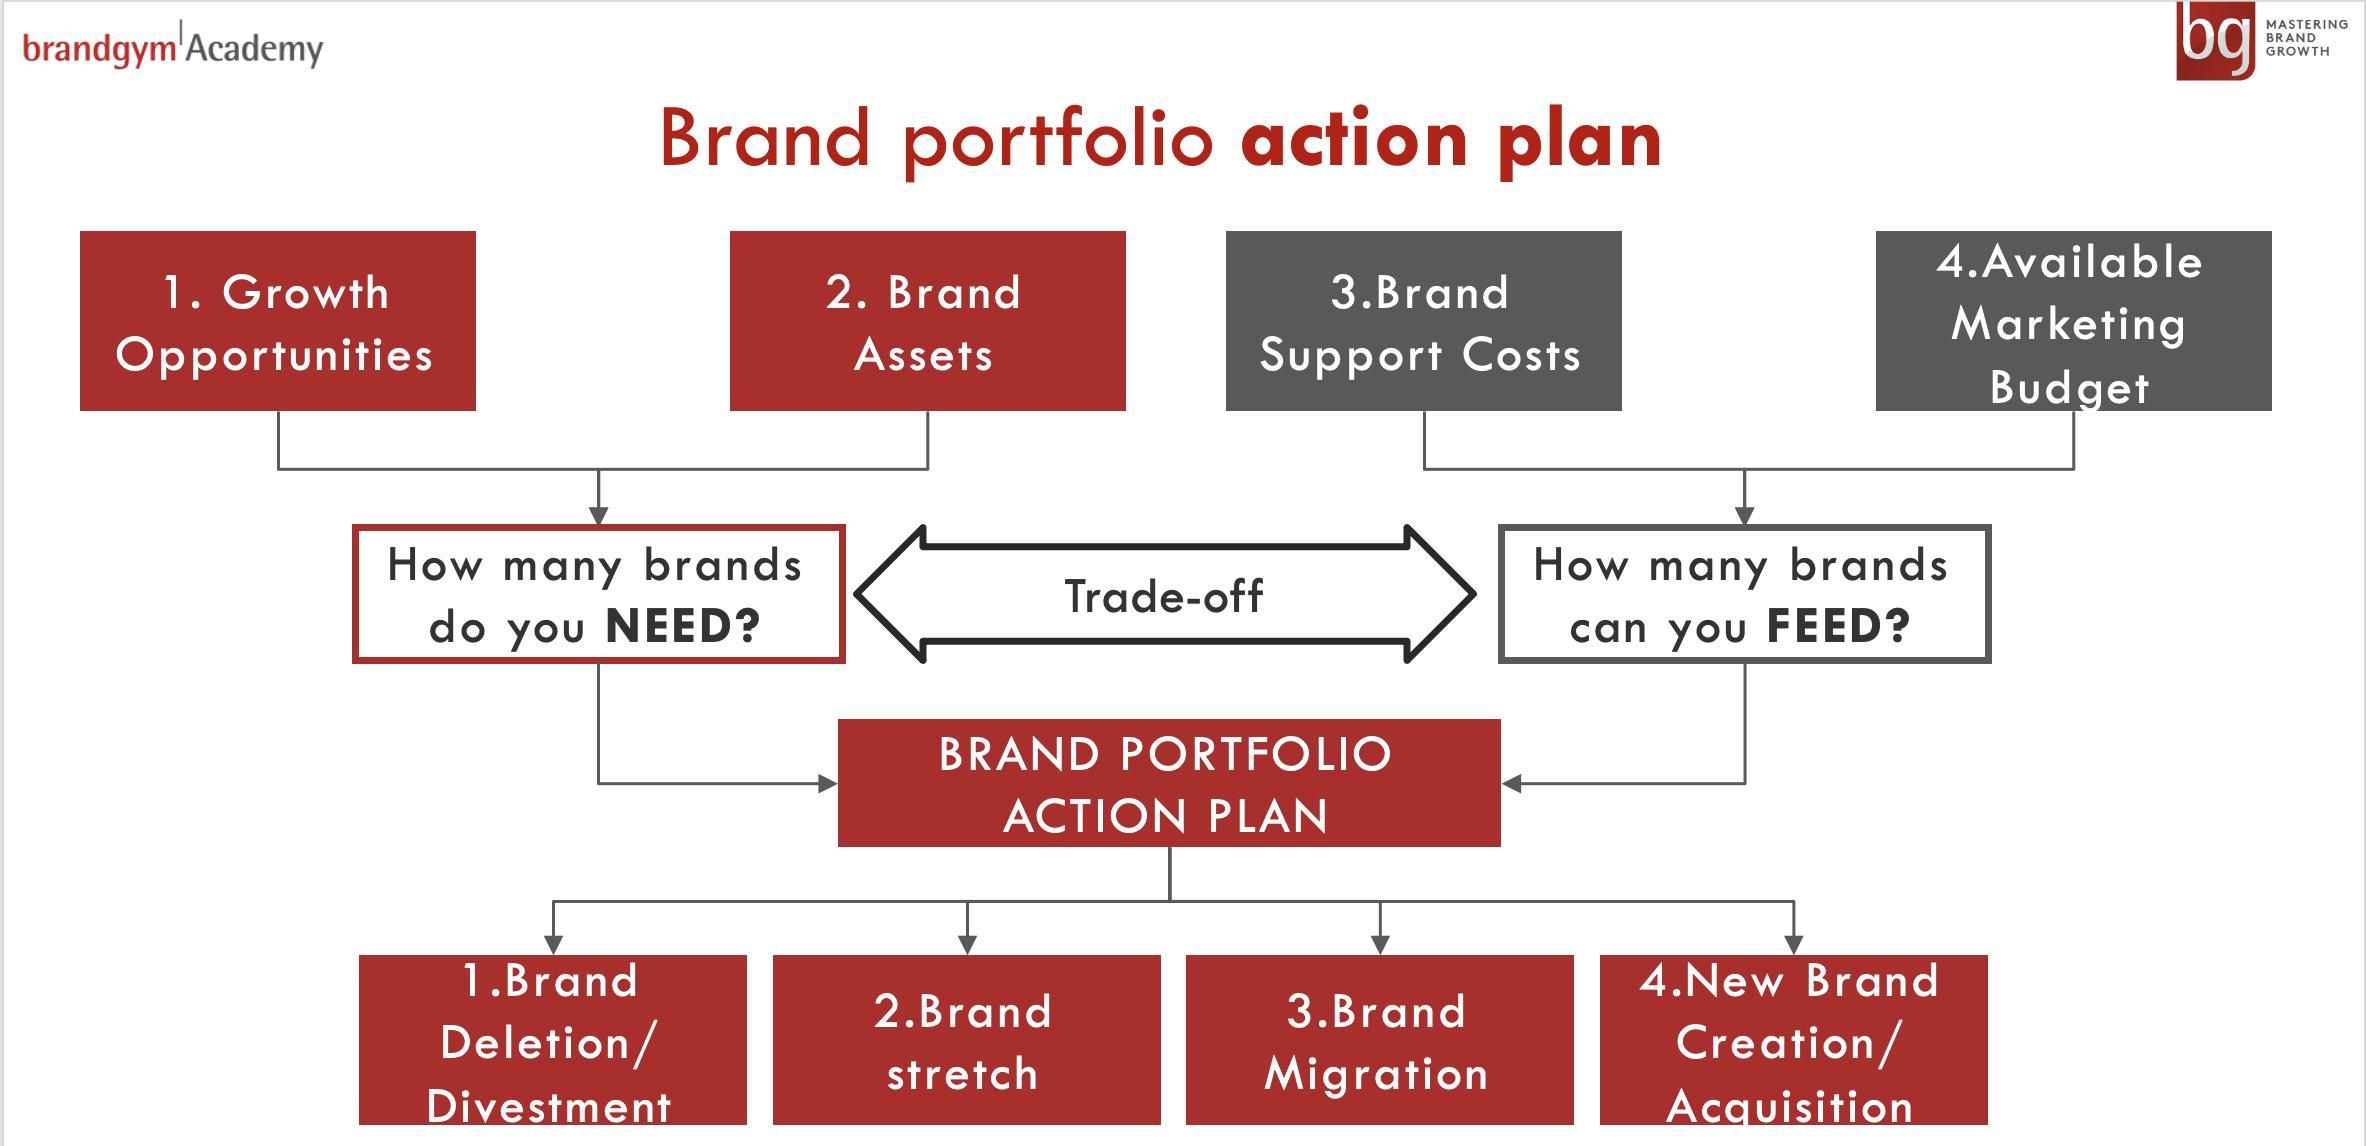 Brandgym Academy Brand Portfolio Model